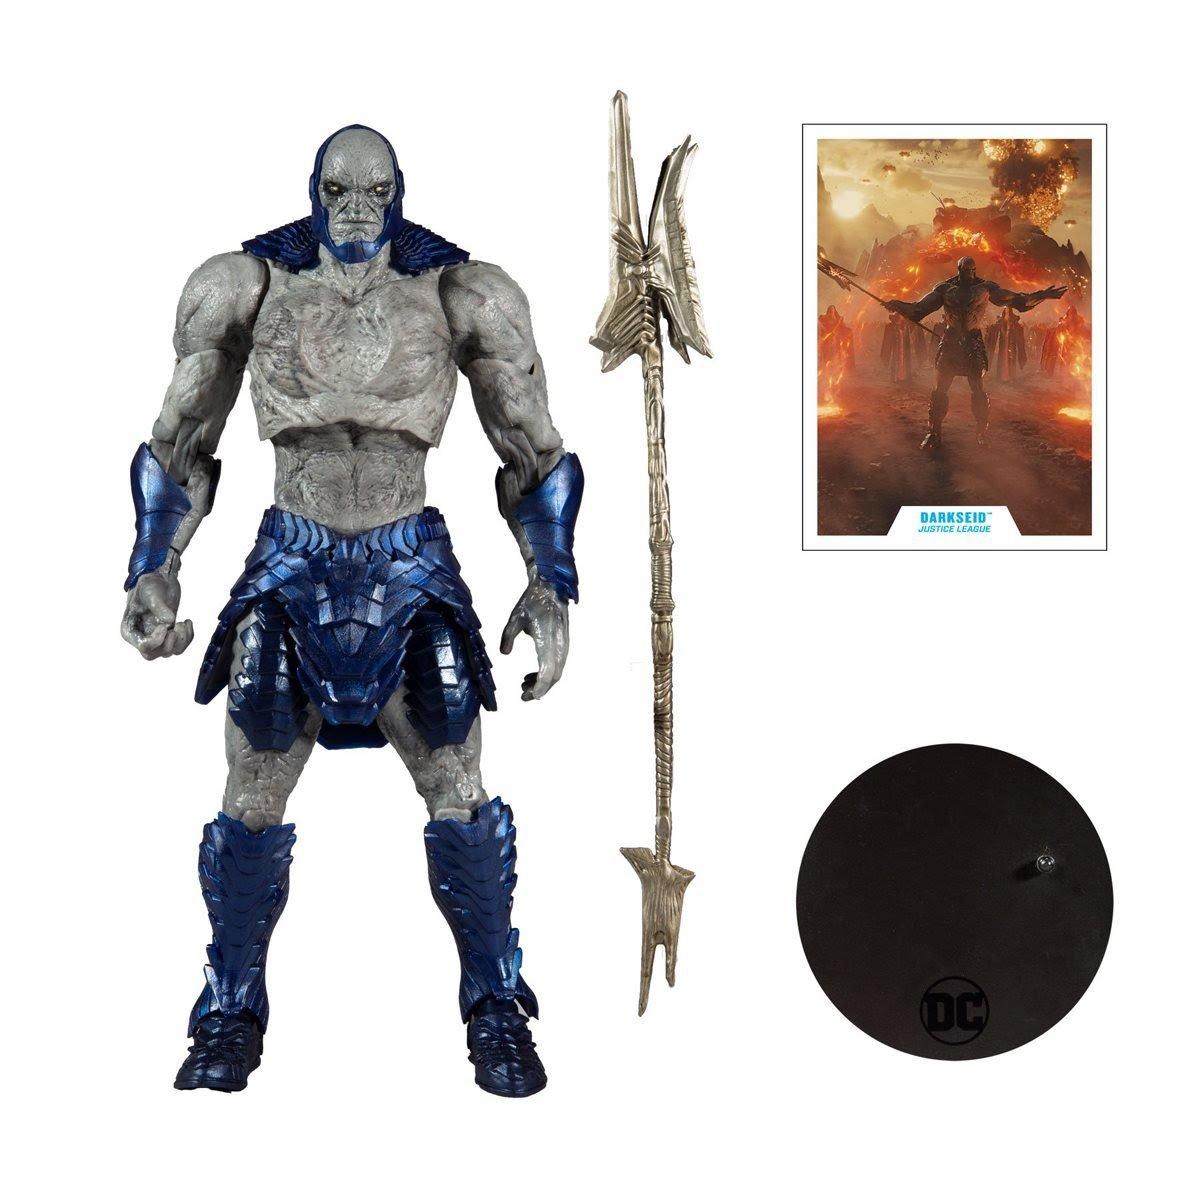 DC Zac Snyder Justice League - DarkSeid 10 Inc Mega Figure Set